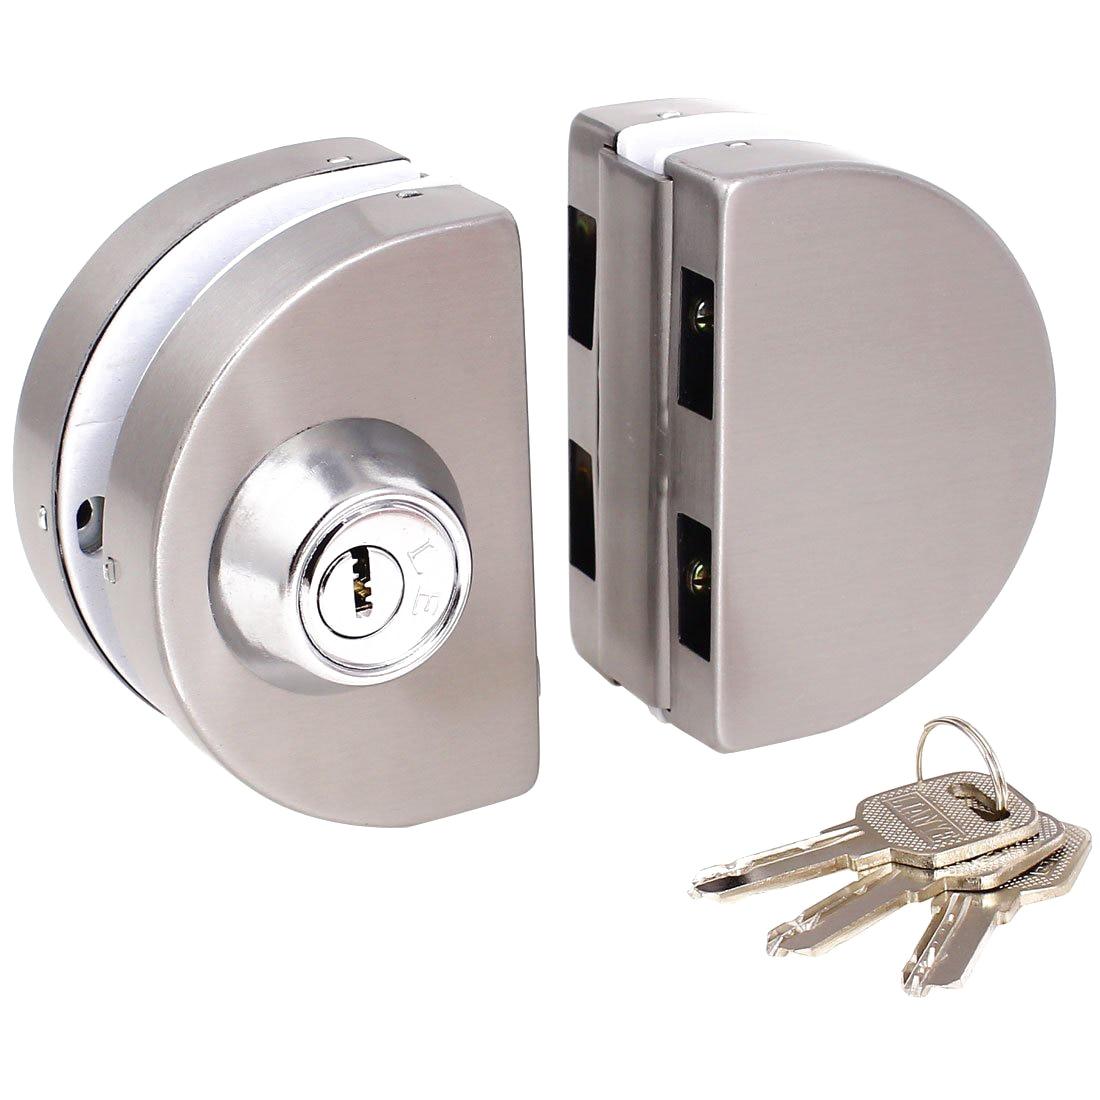 Entry Gate 10-12mm Glass Swing Push Sliding Door Lock with Keys